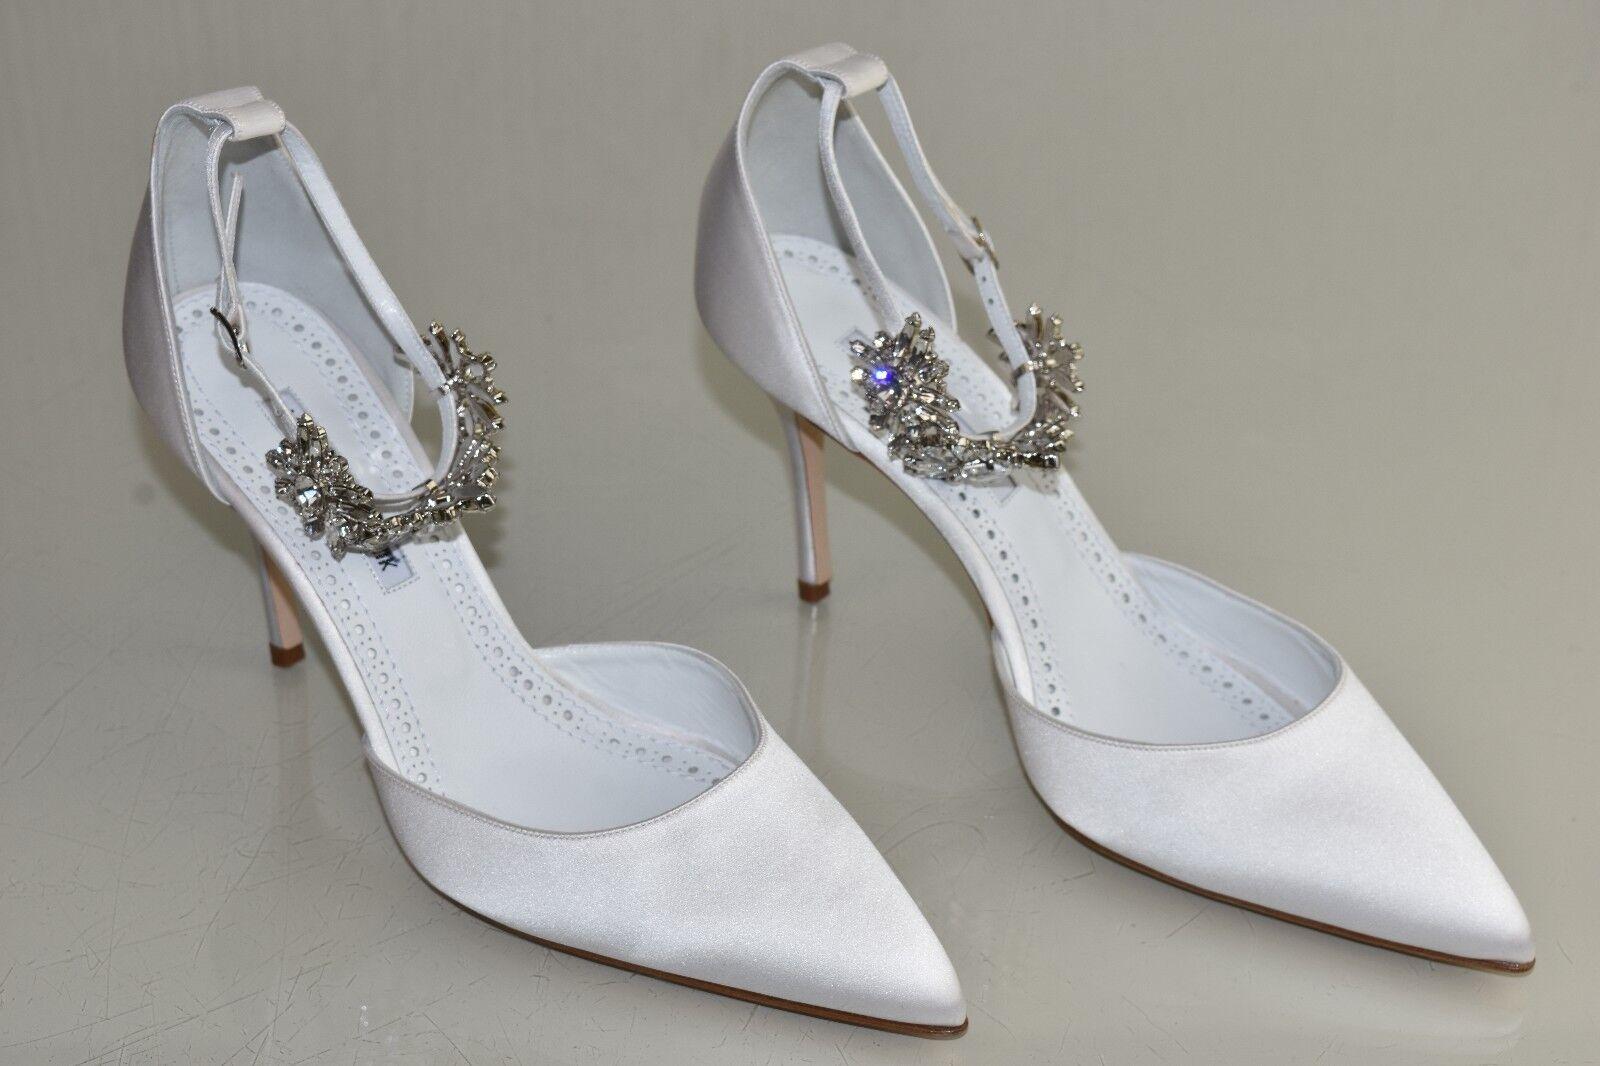 1045 NEW Manolo Blahnik Sicariata Sicariata Sicariata White  Satin Pumps Jeweled shoes Wedding 41.5 1397f1